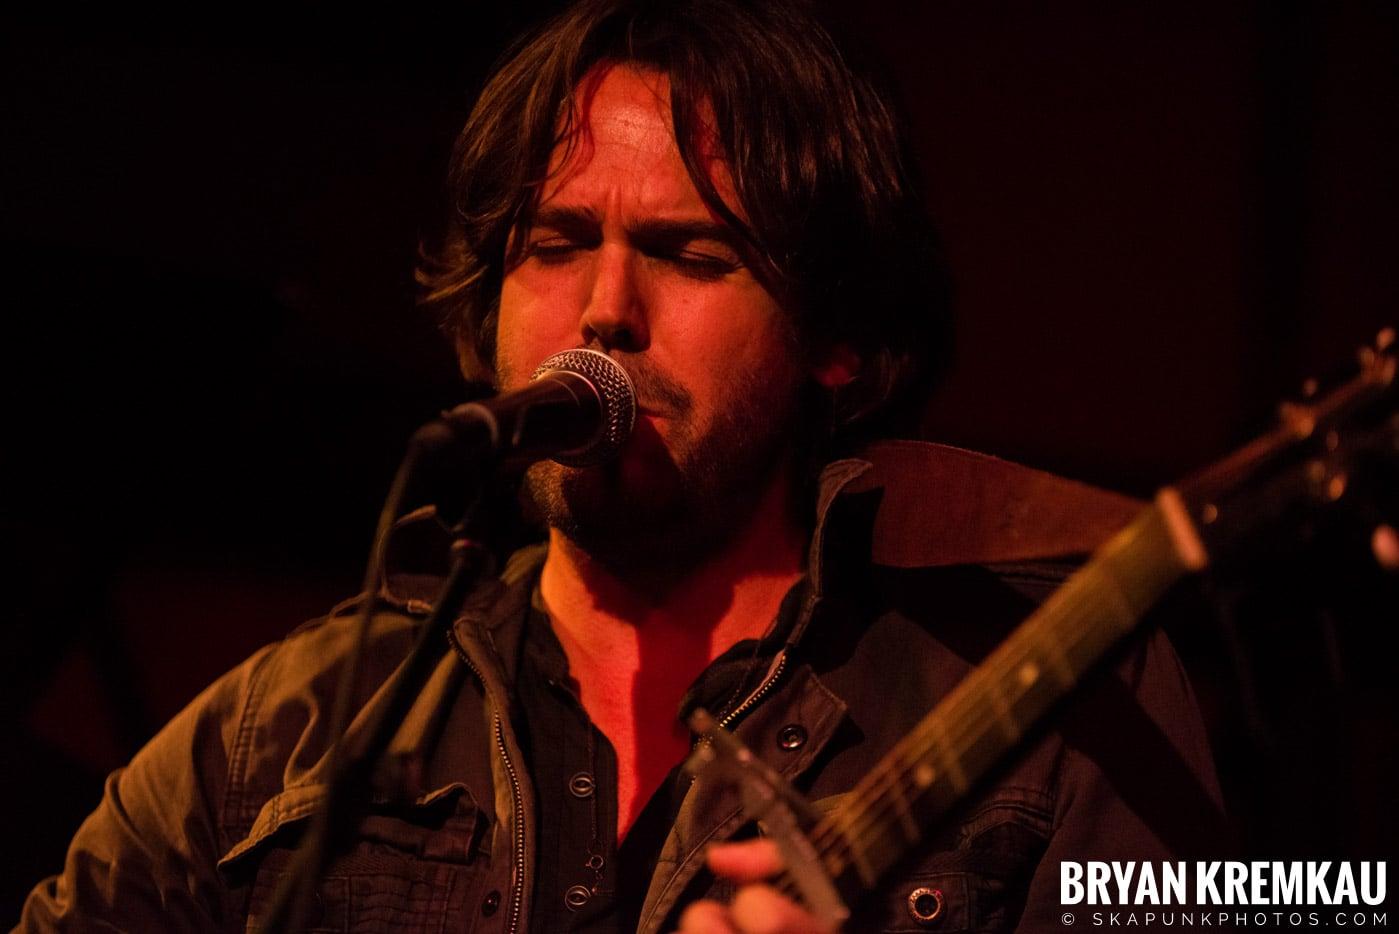 Peter Bradley Adams @ Rockwood Music Hall, NYC - 3.9.13 (23)